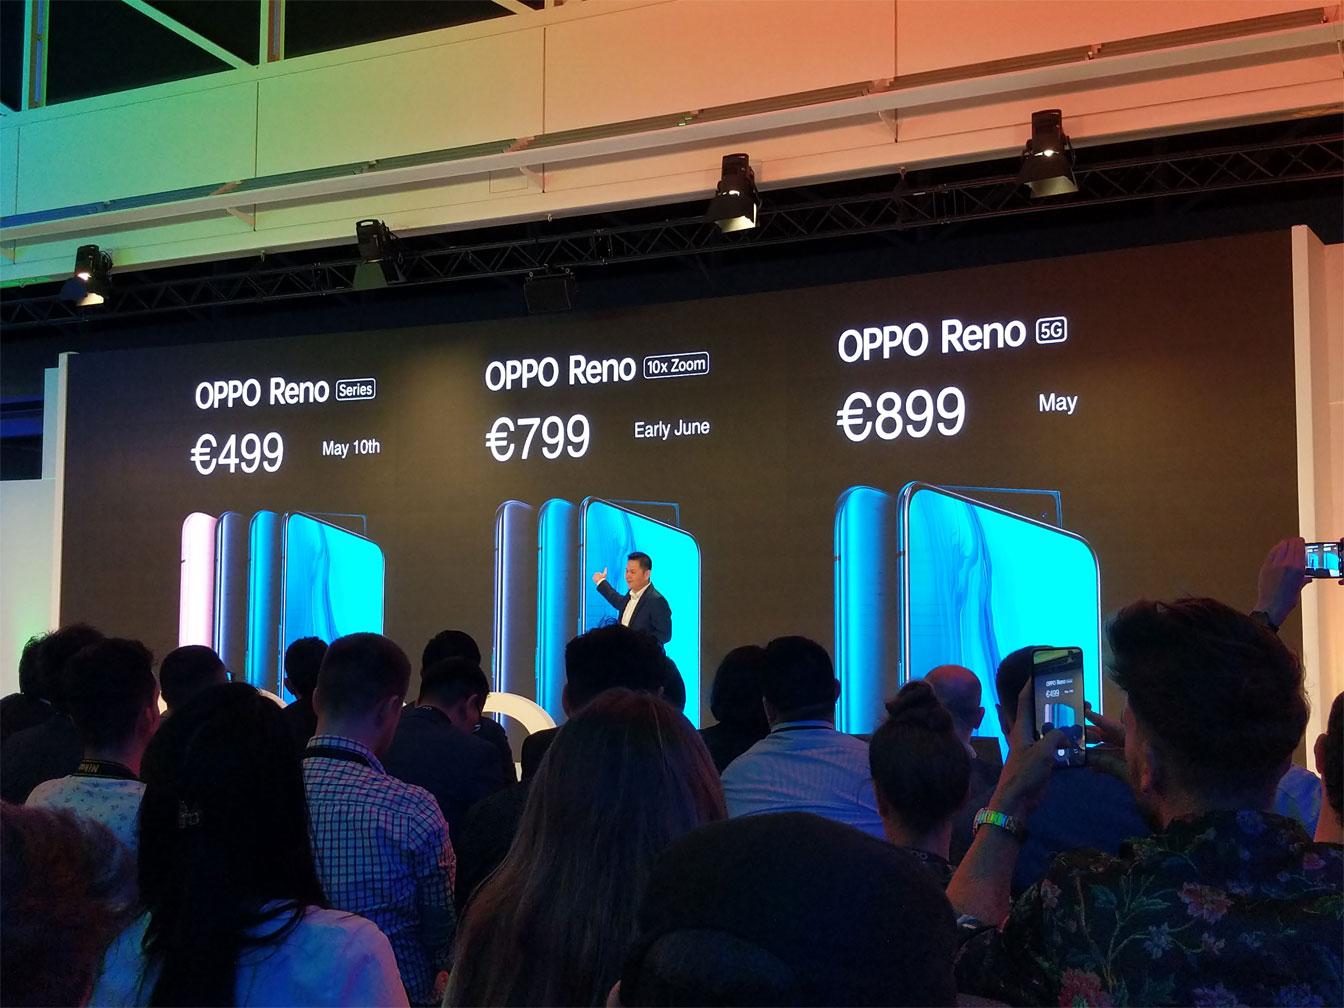 Oppo Reno Prix